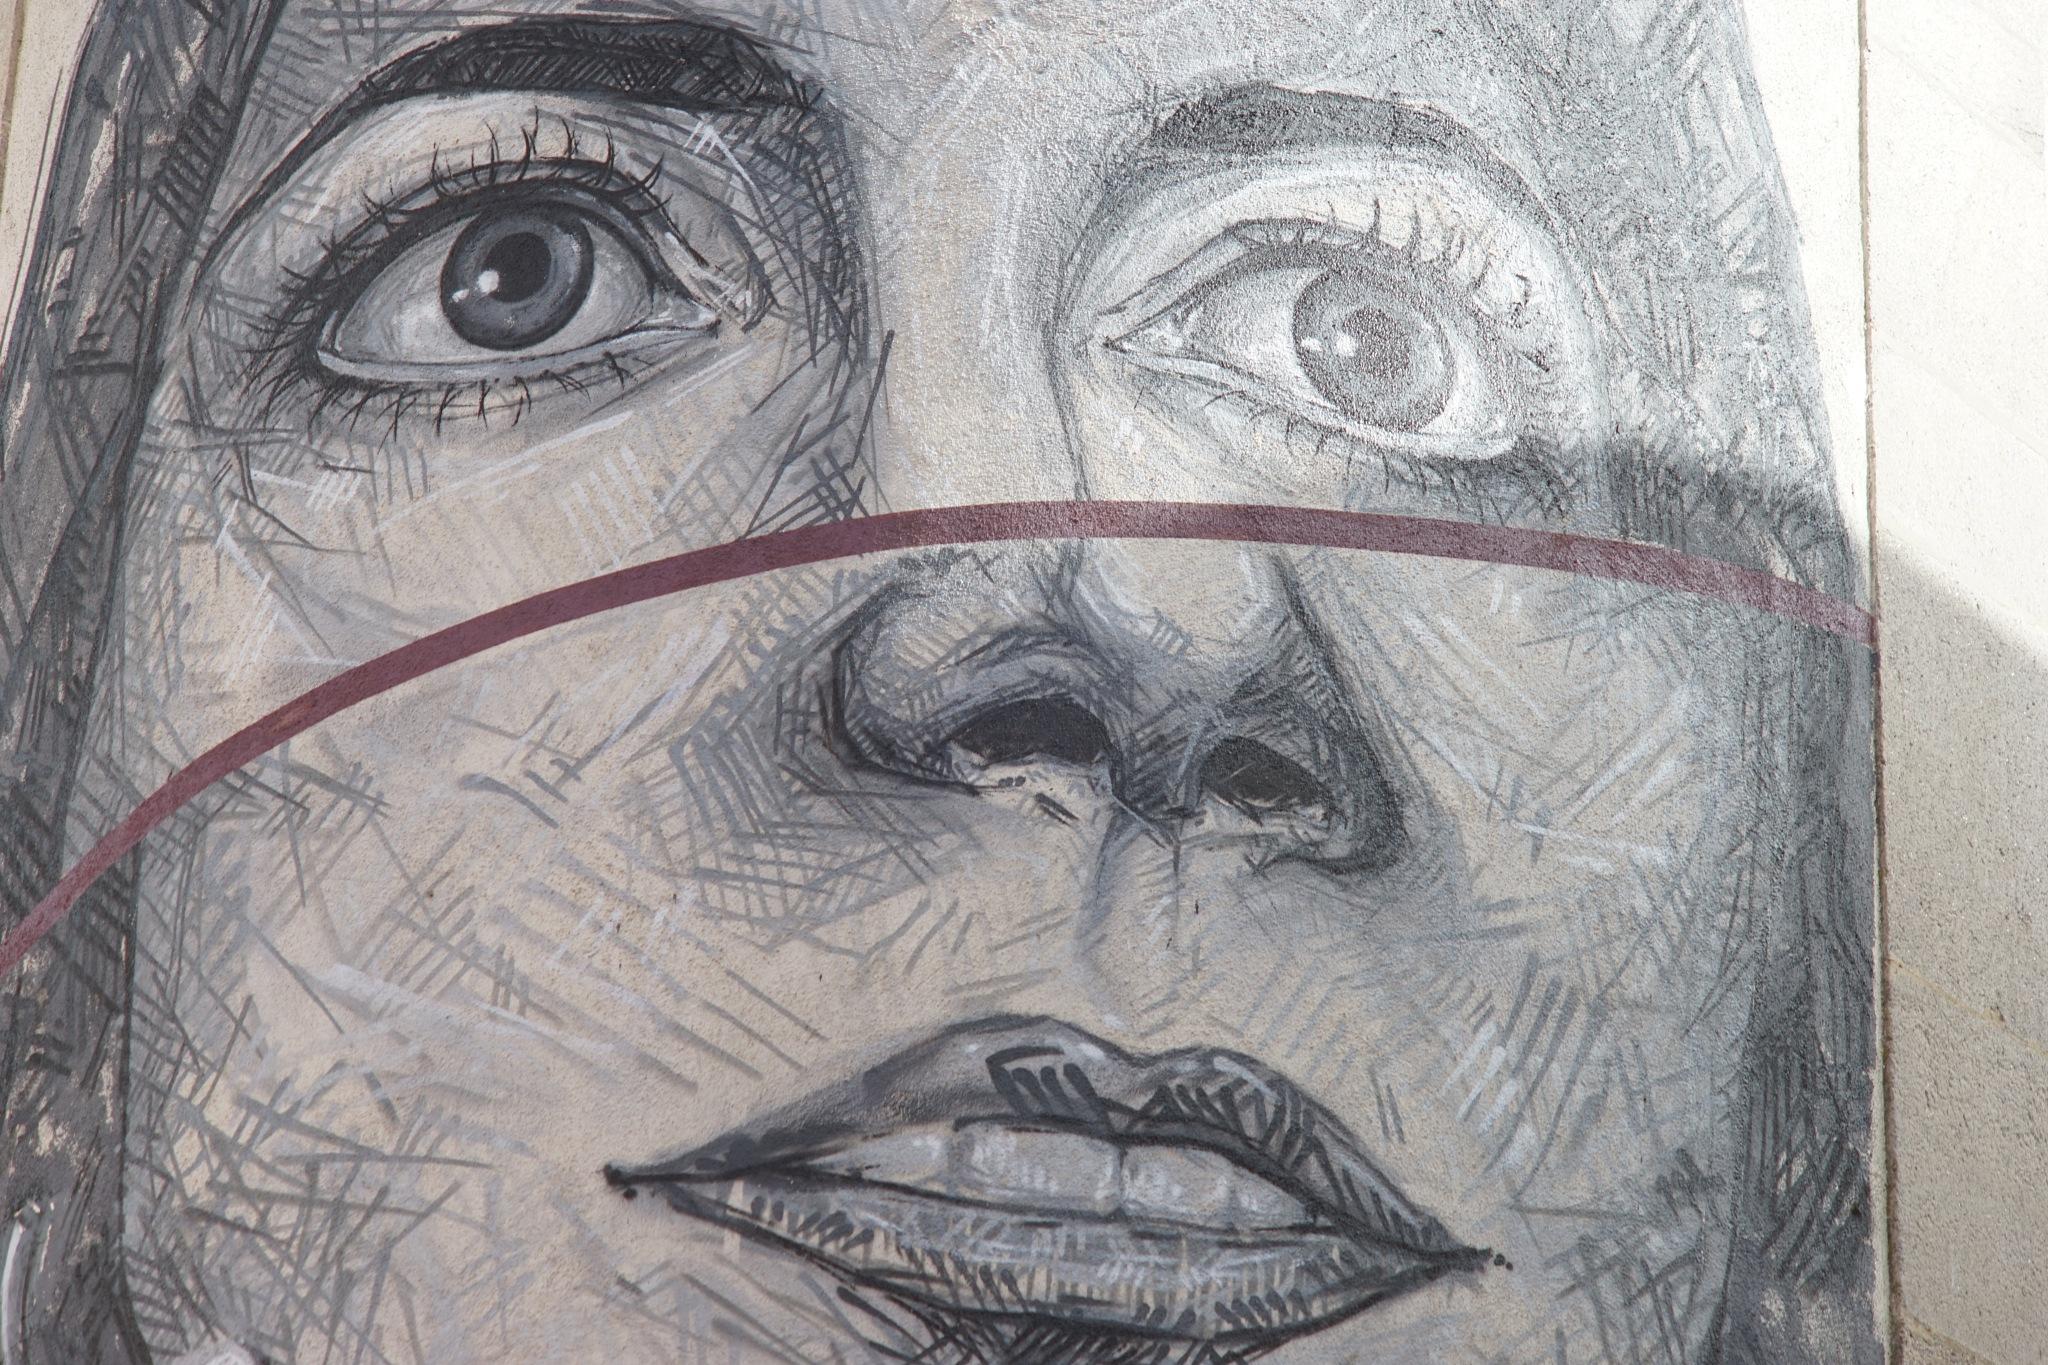 wall graffiti art by Pedro Valente